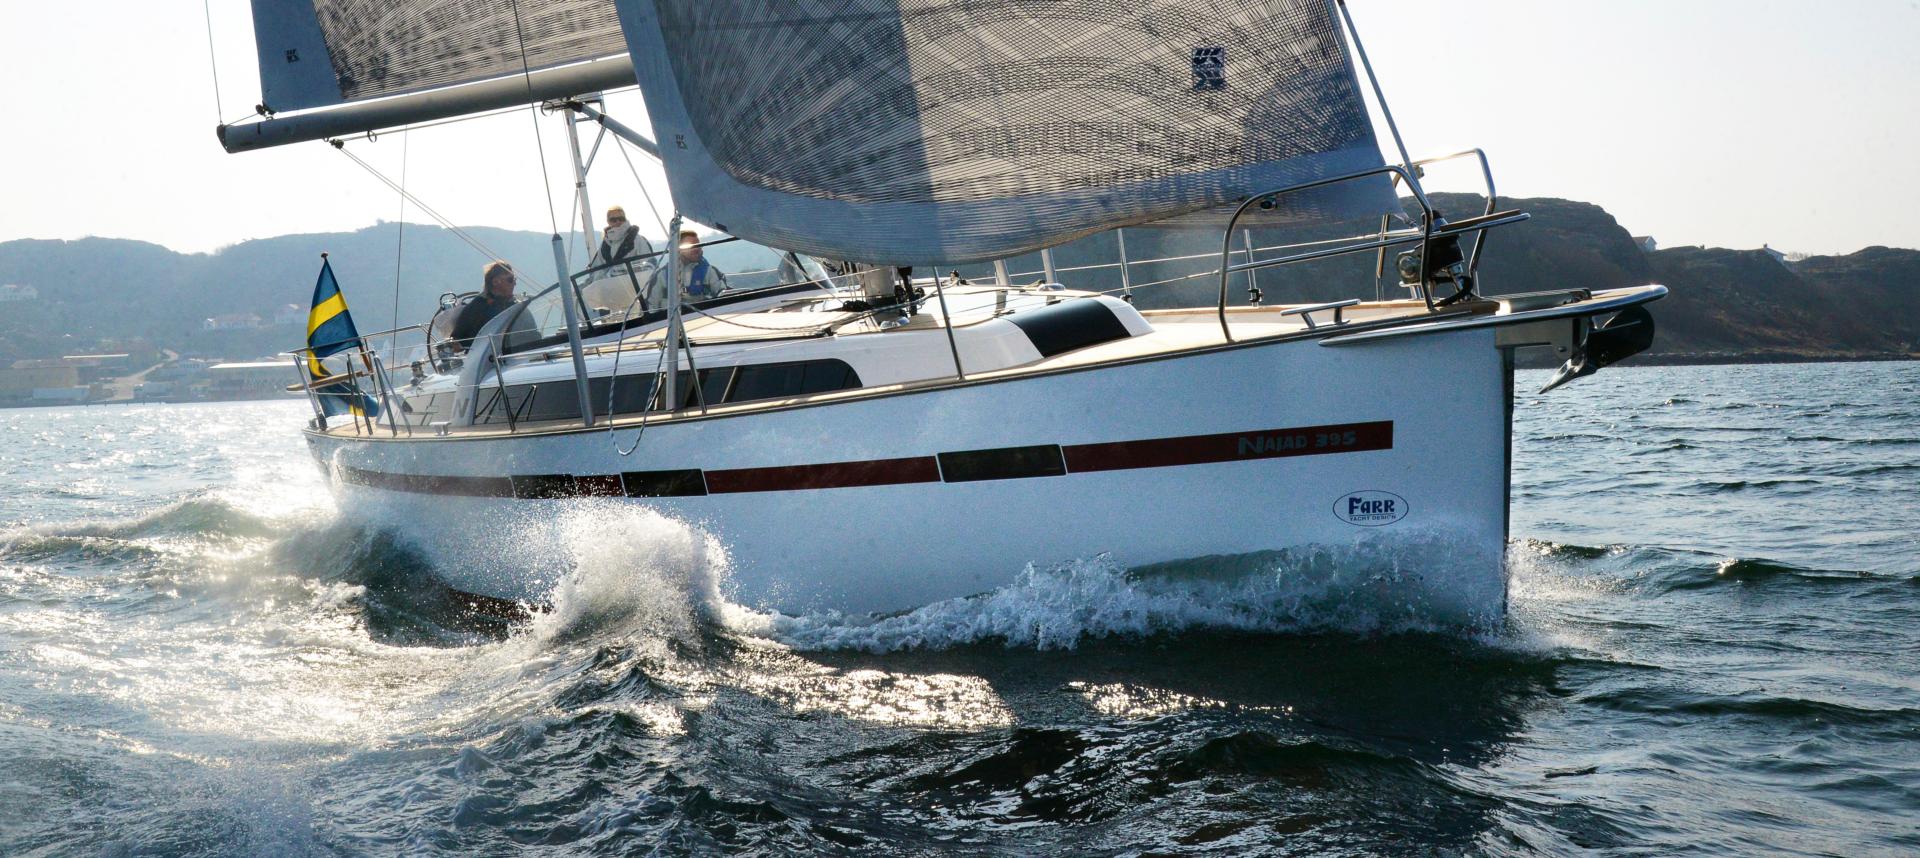 N395 AC – A true Mini Superyacht